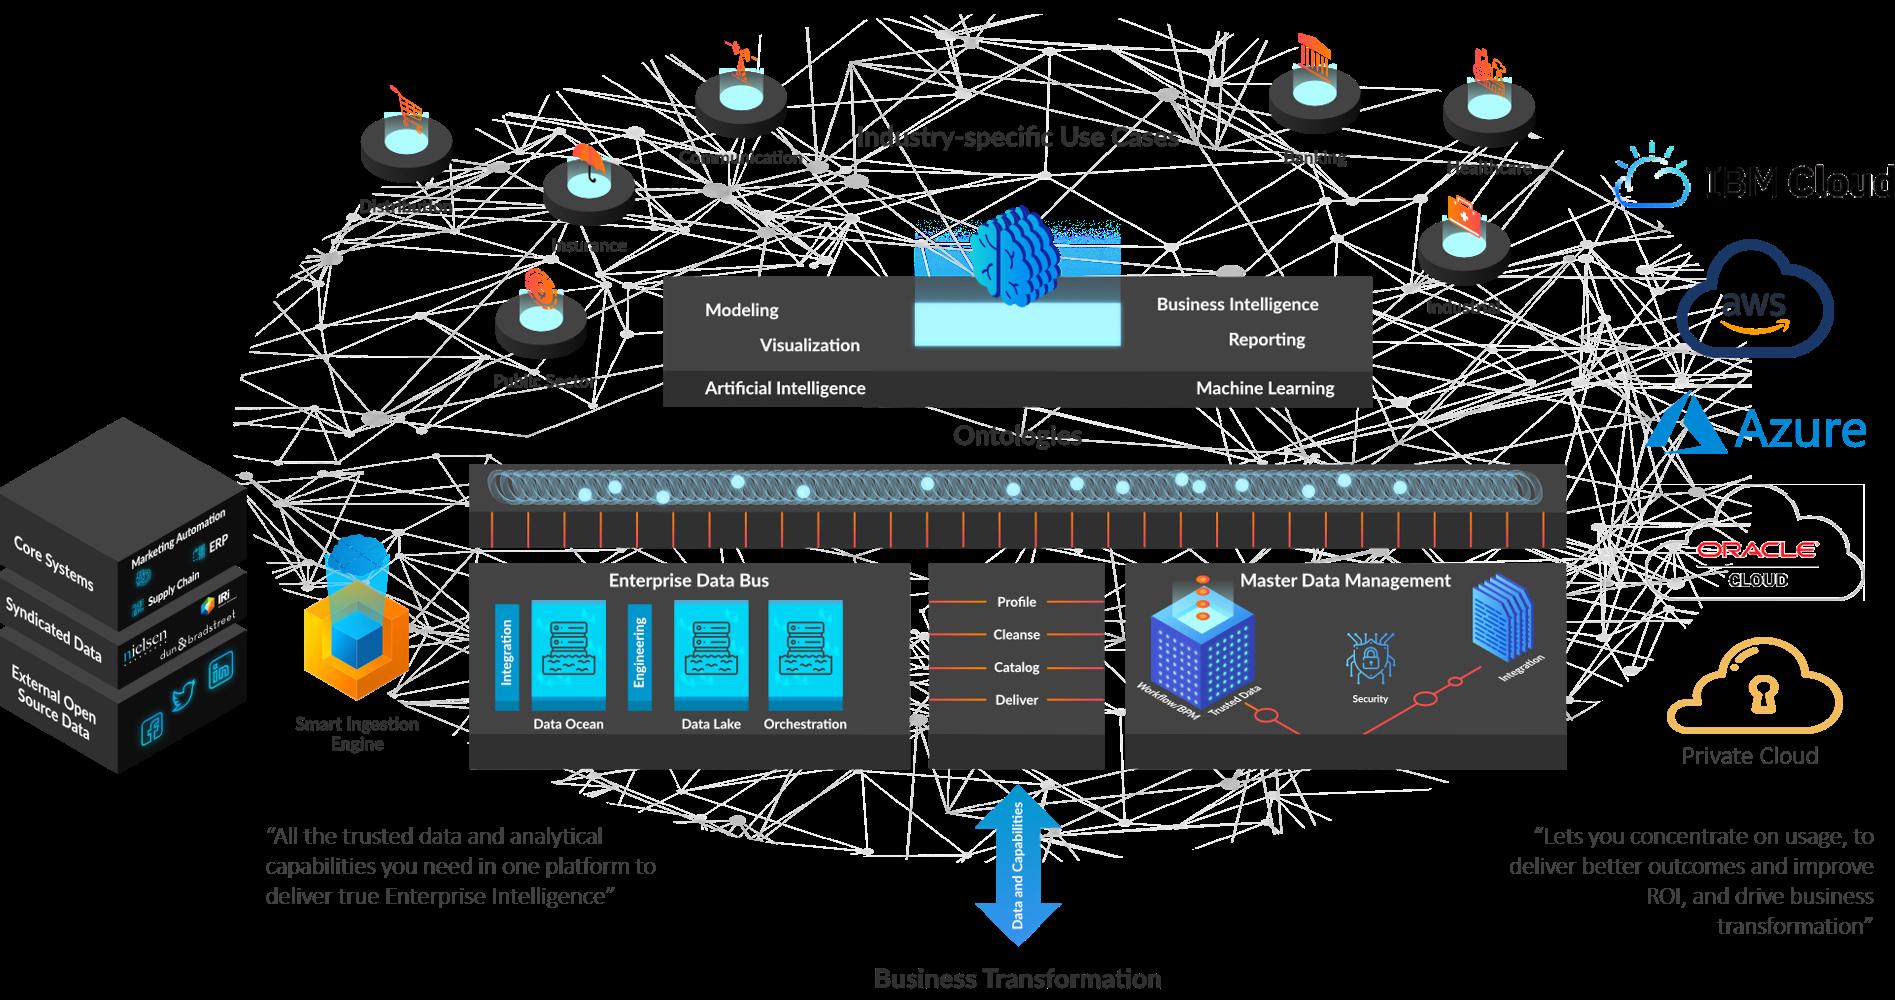 Enterprise Intelligence Hub